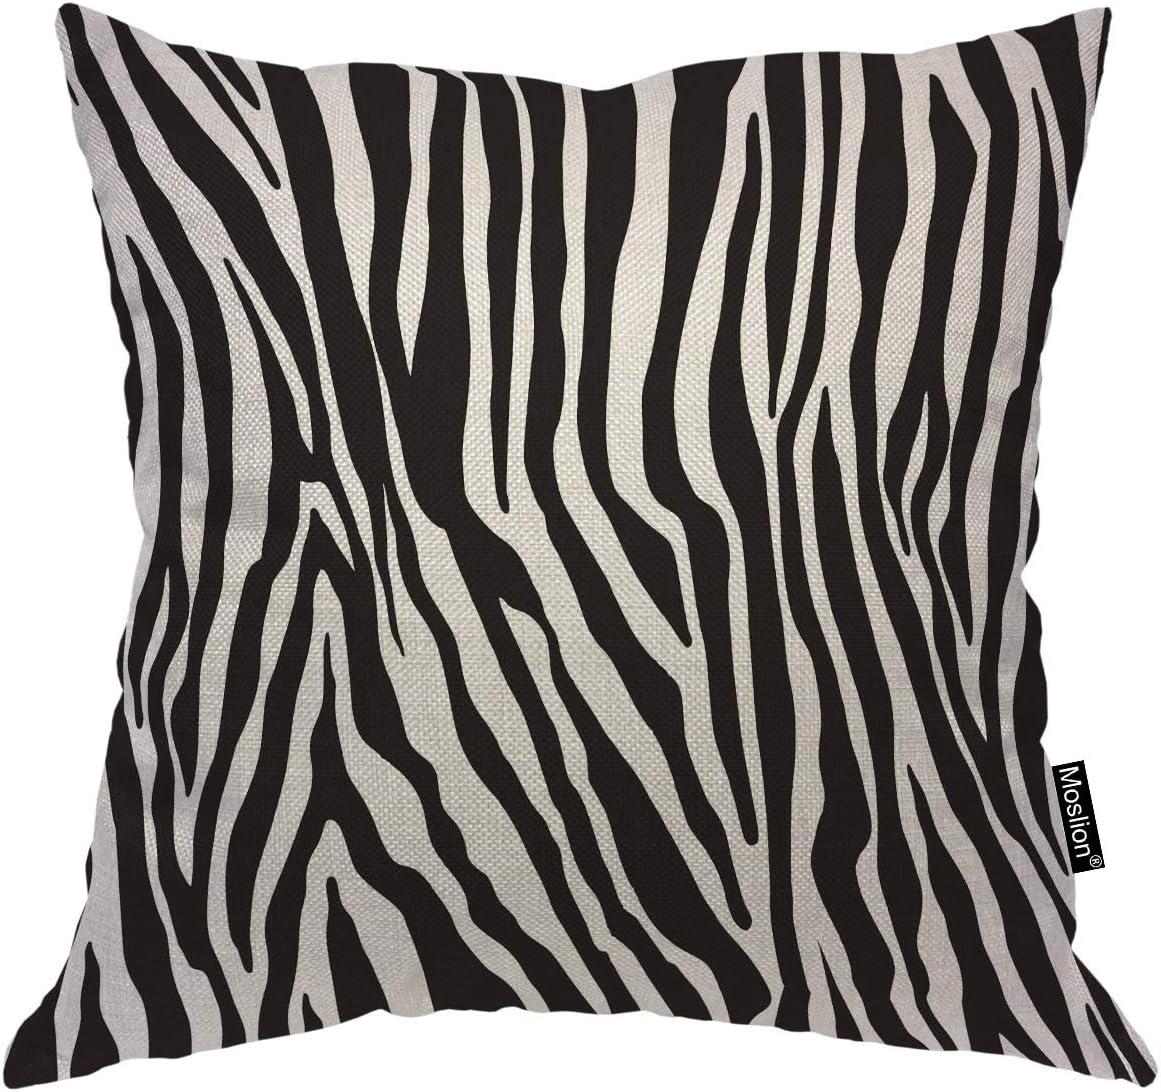 Amazon Com Moslion Zebra Print Decorative Pillow Covers 16x16 Inch Black White Leopard Line Stripes Wild Animal Skin Throw Pillow Case Cotton Linen Canvas Square Cushion Accent Pillow For Sofa Bed Home